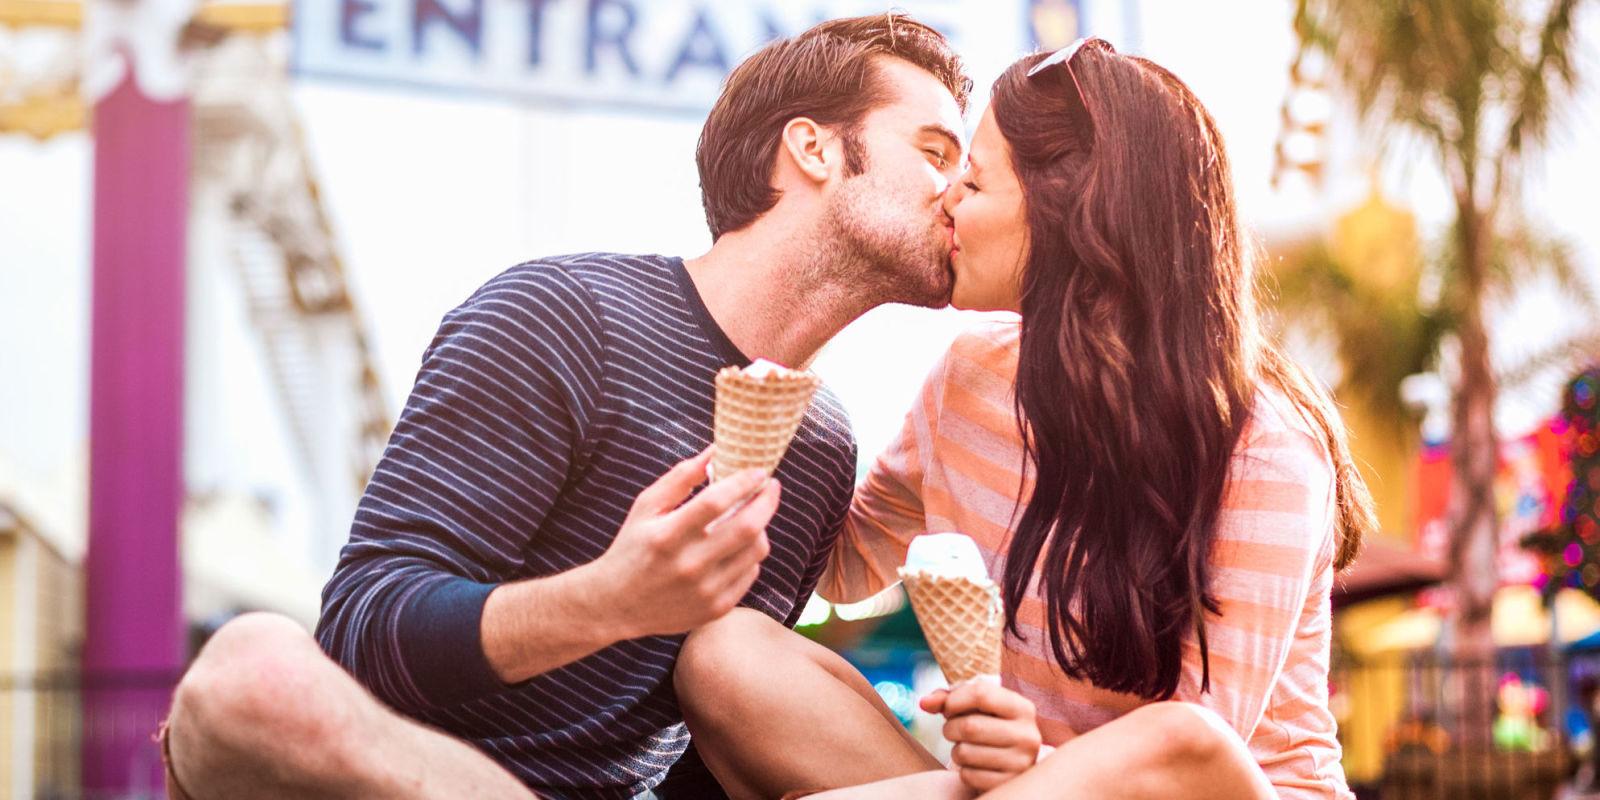 Adult dating in leland mississippi